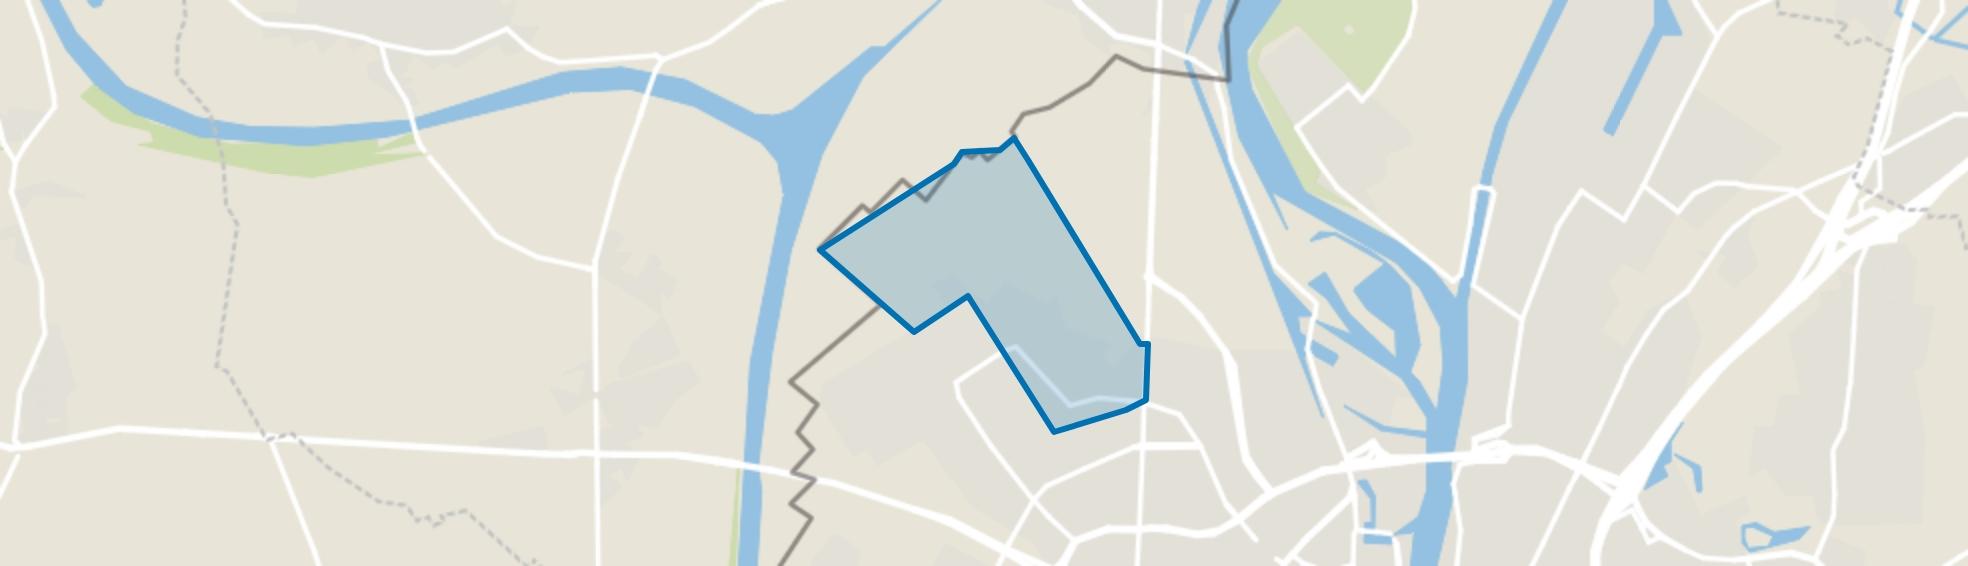 Oud-Caberg, Maastricht map